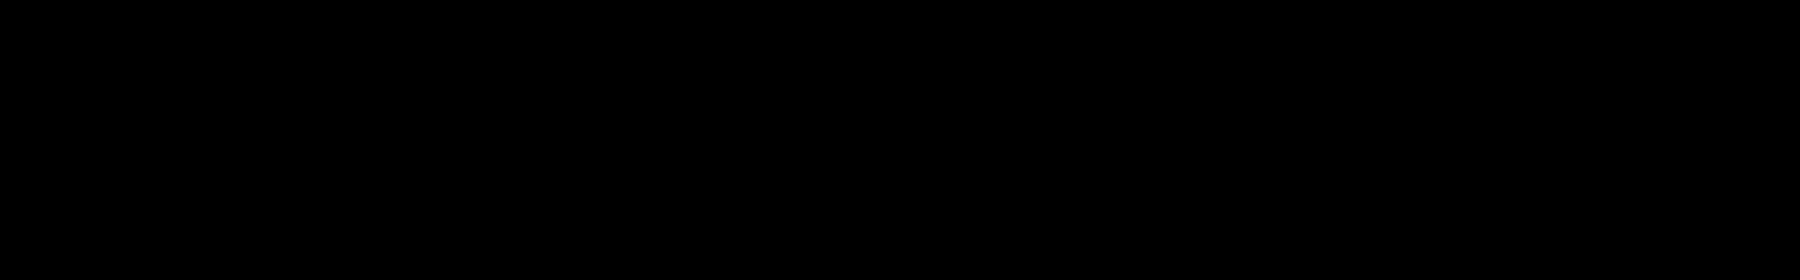 ALCHEMIST - HIP HOP MATTER audio waveform